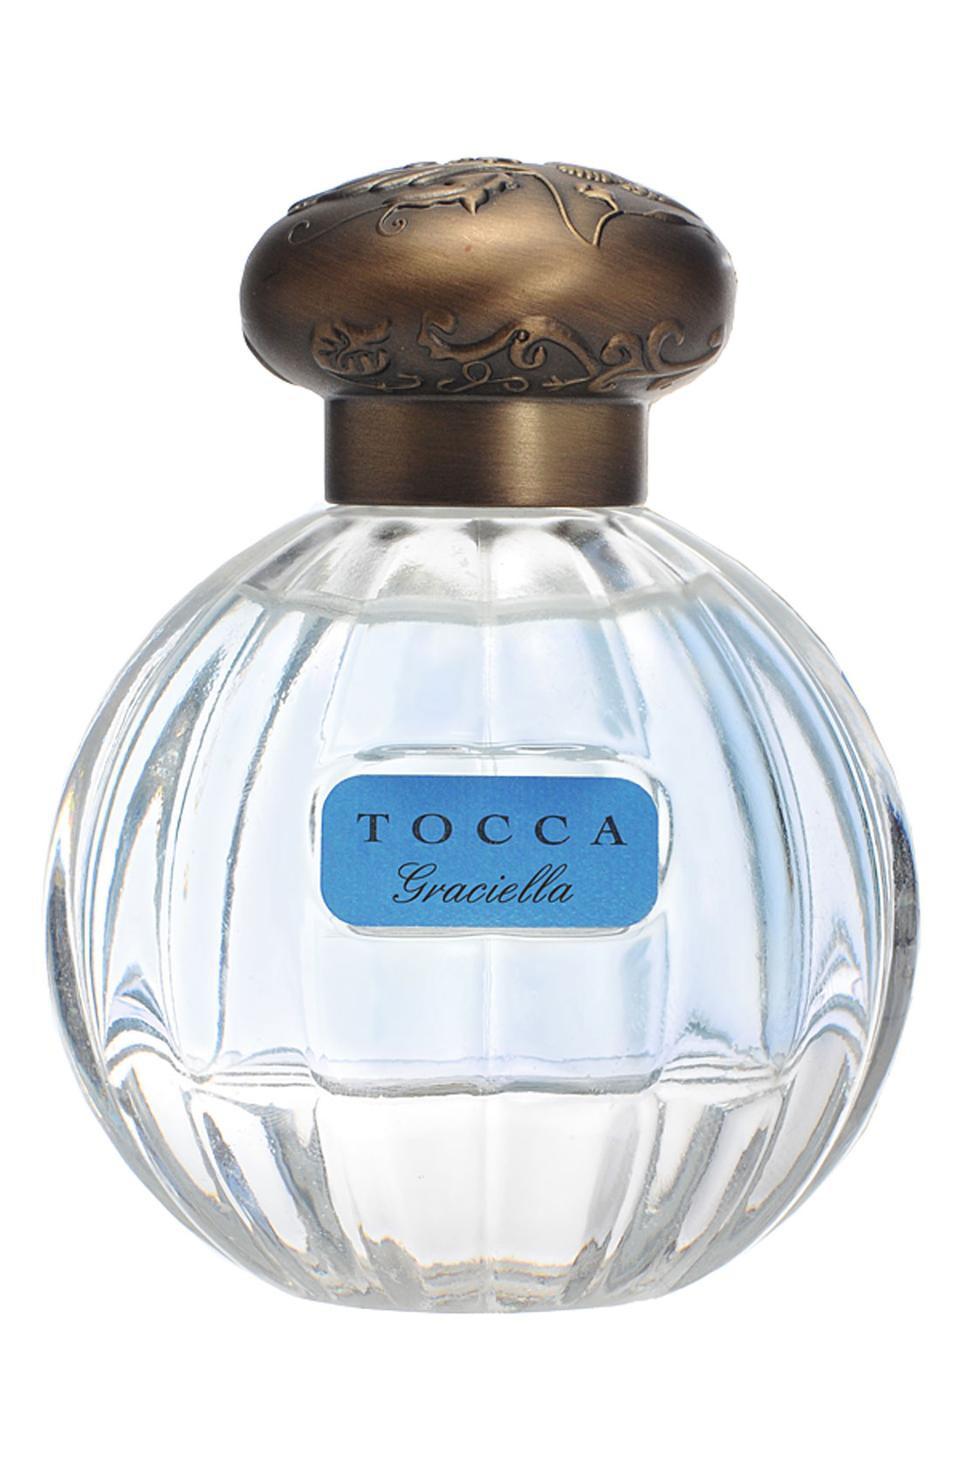 Tocca Graciella аромат для женщин